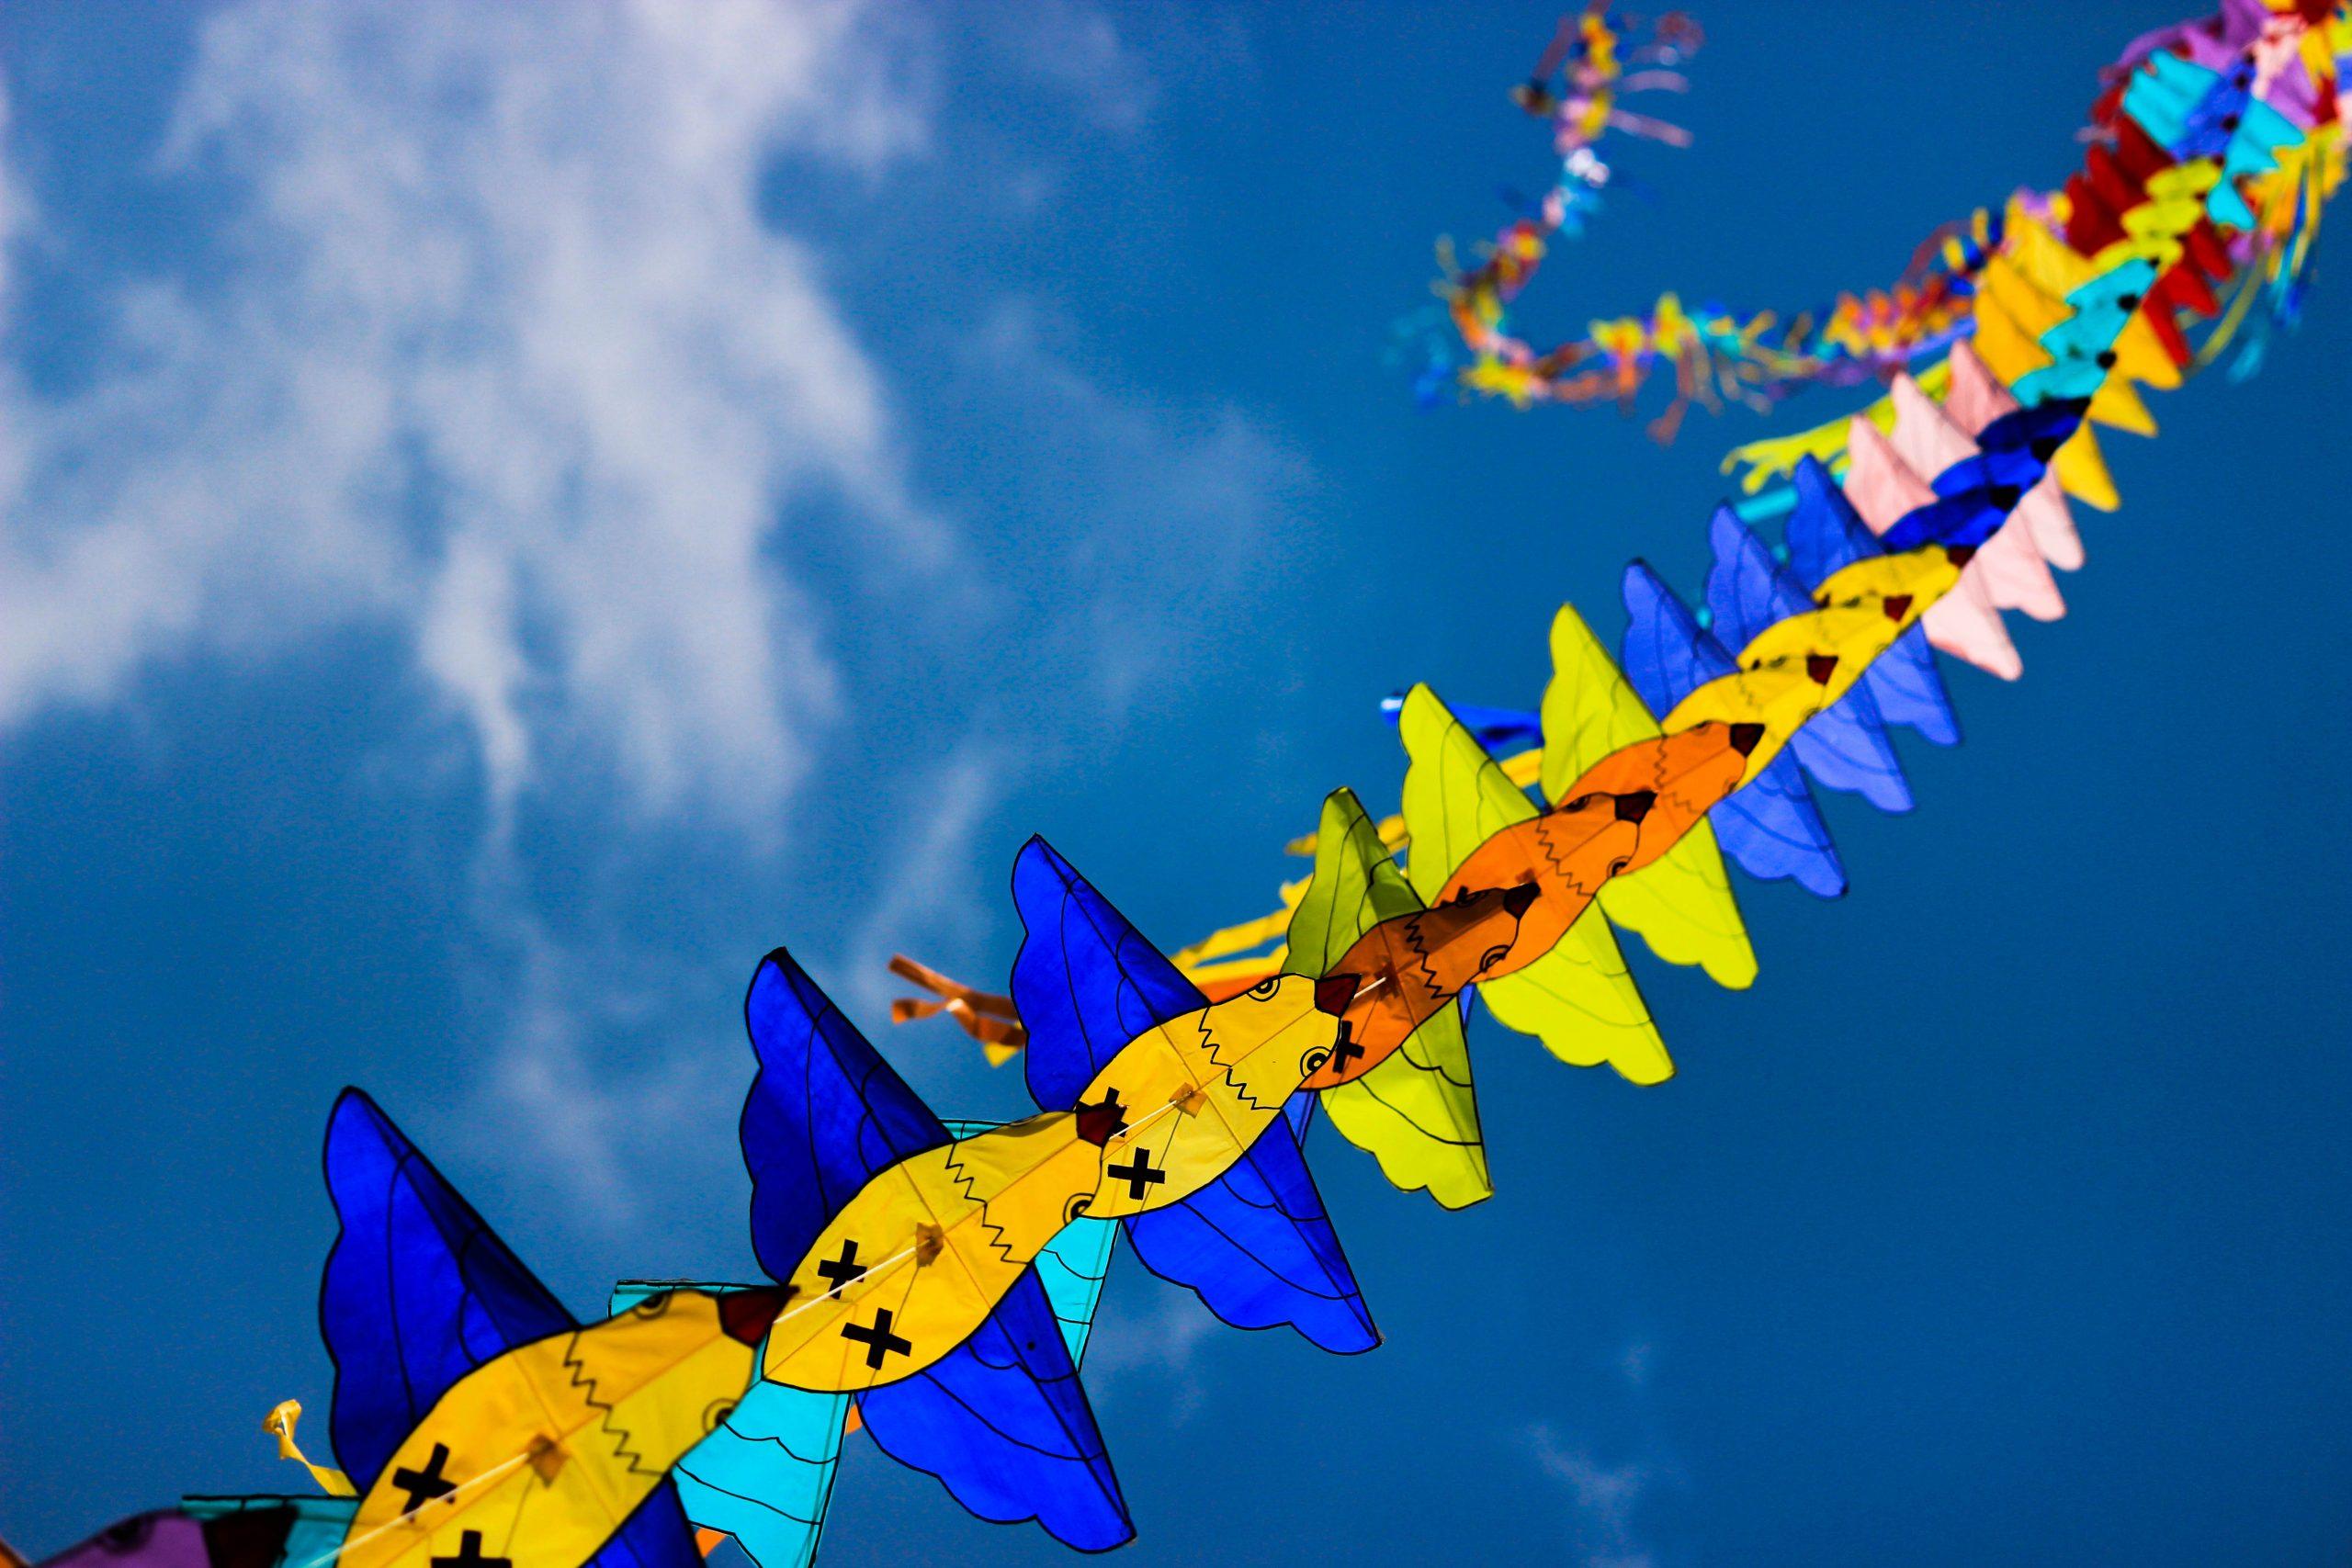 Dussehra kite festival at Mysore